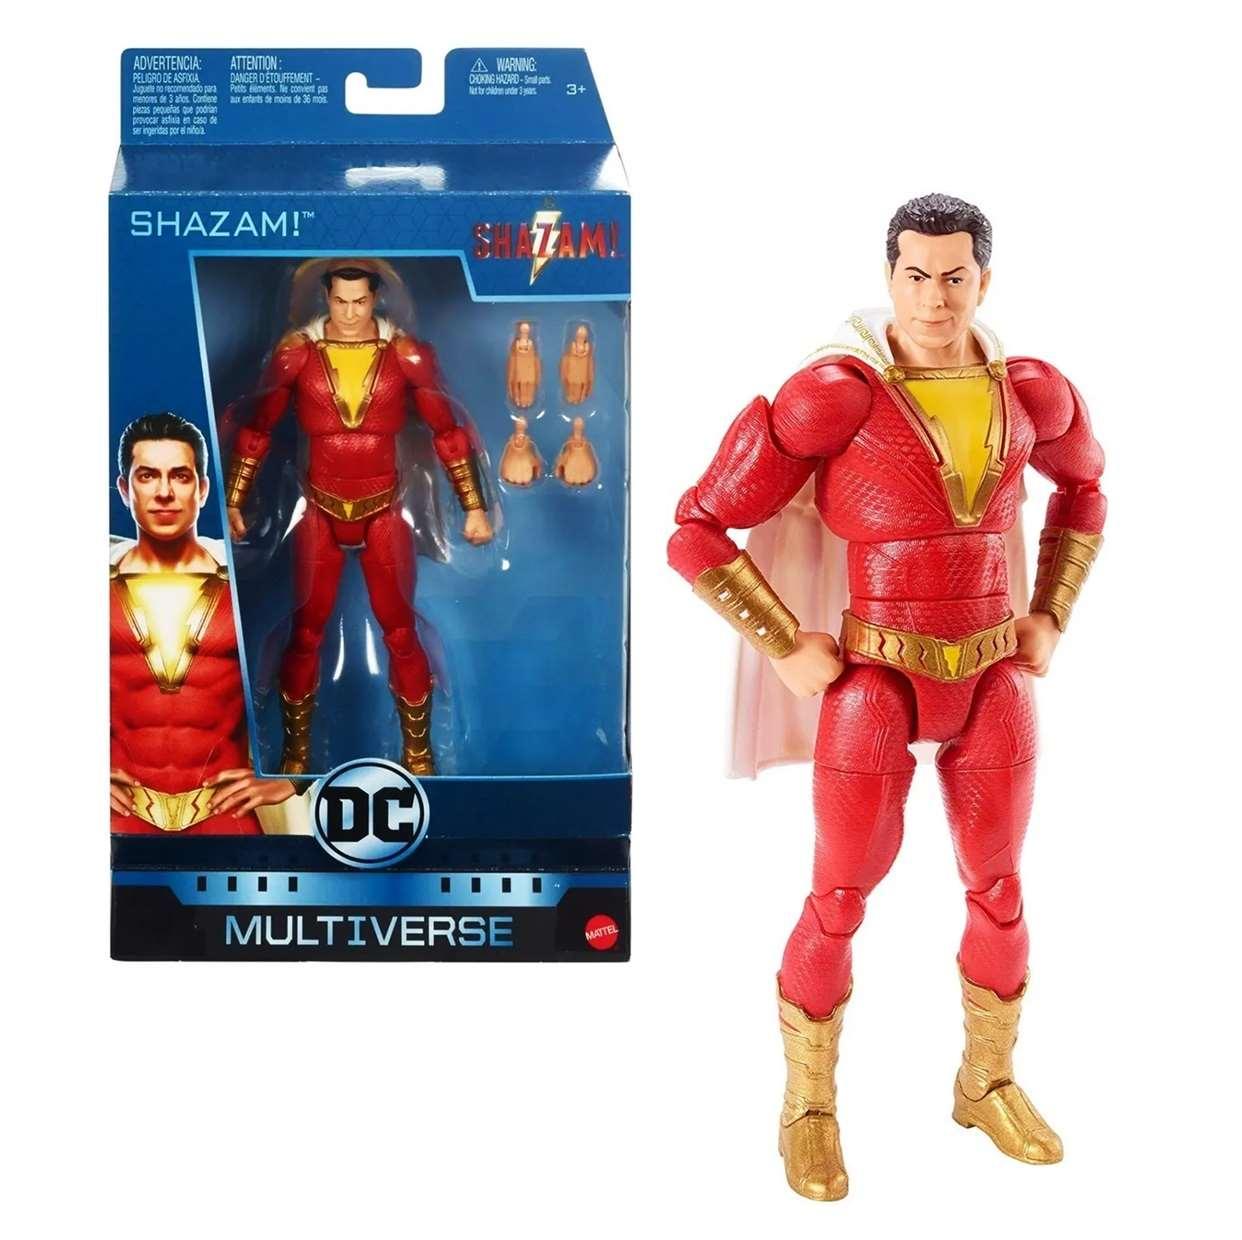 Shazam! Figura Dc Comics Tawkwy Tamny Mattel Multiverse